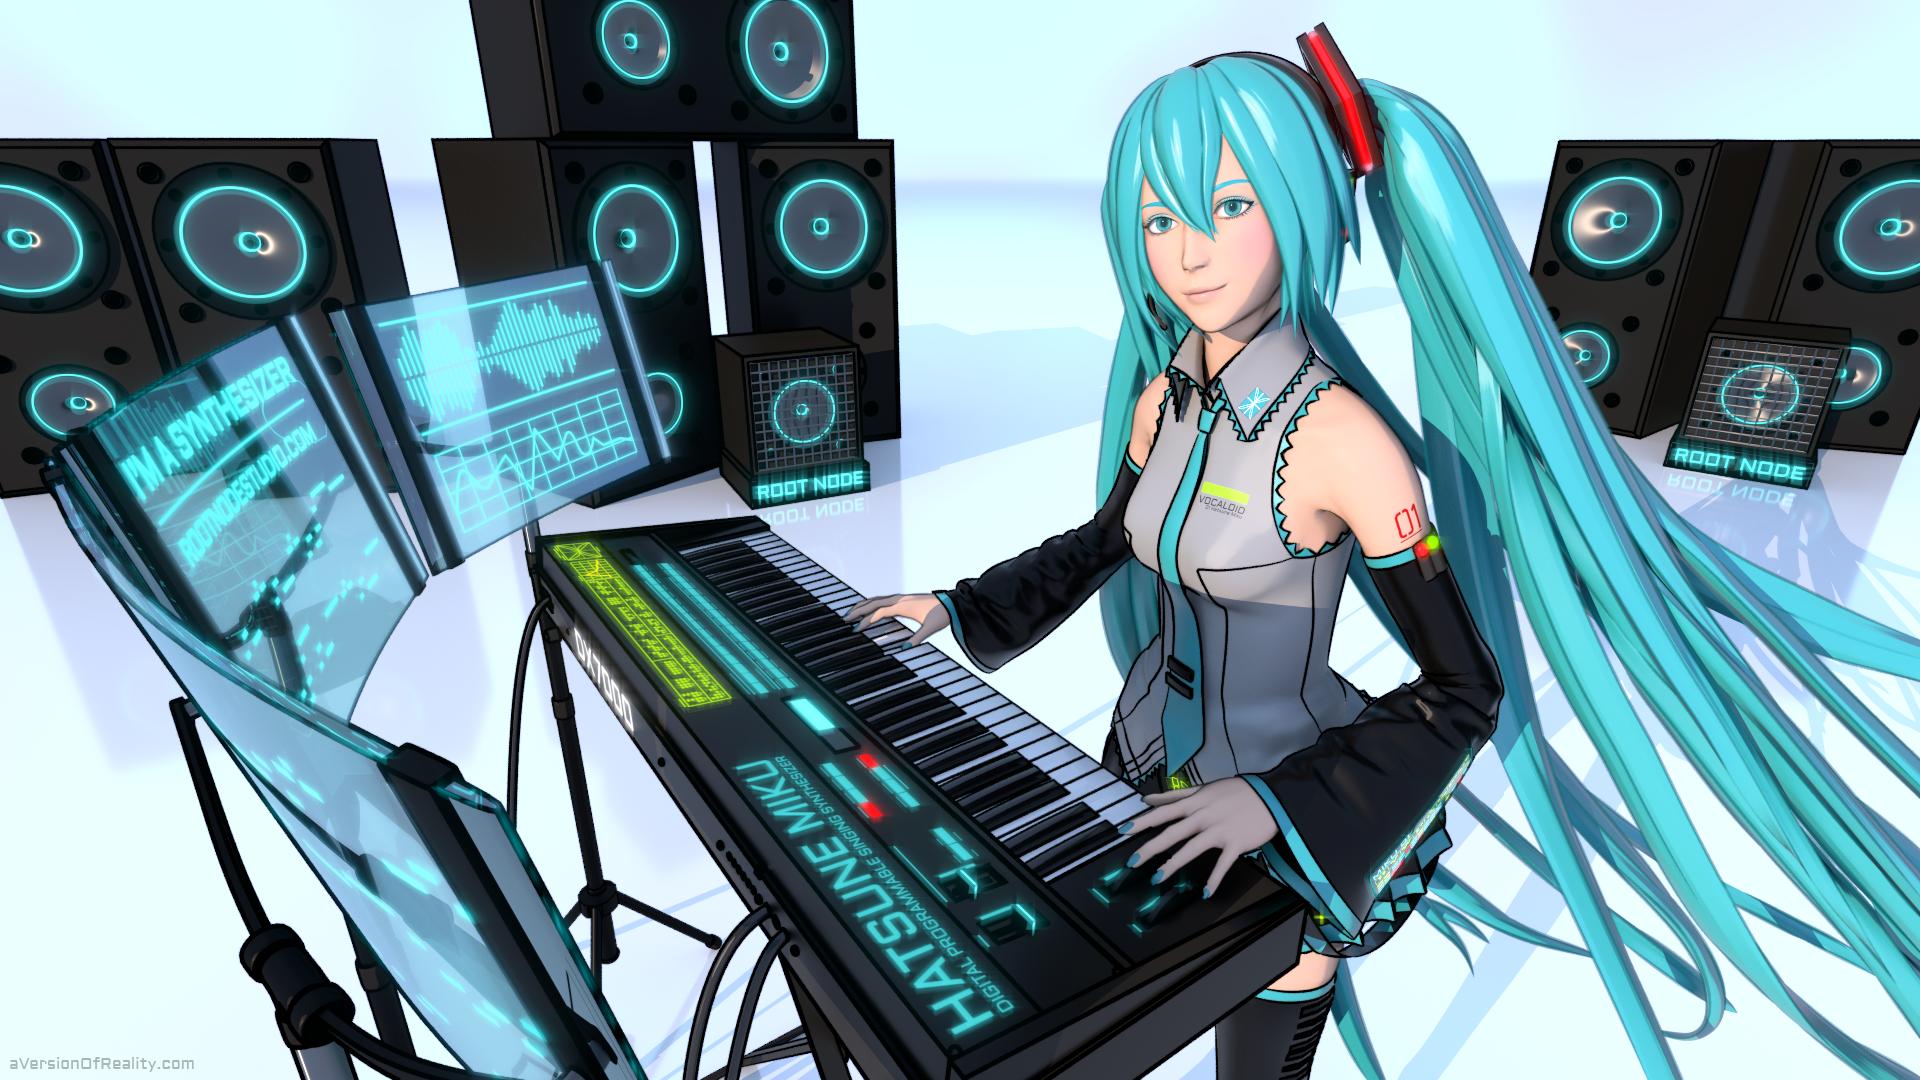 Hatsune Miku: I'm a Synthesizer Cover Art by aVersionOfReality